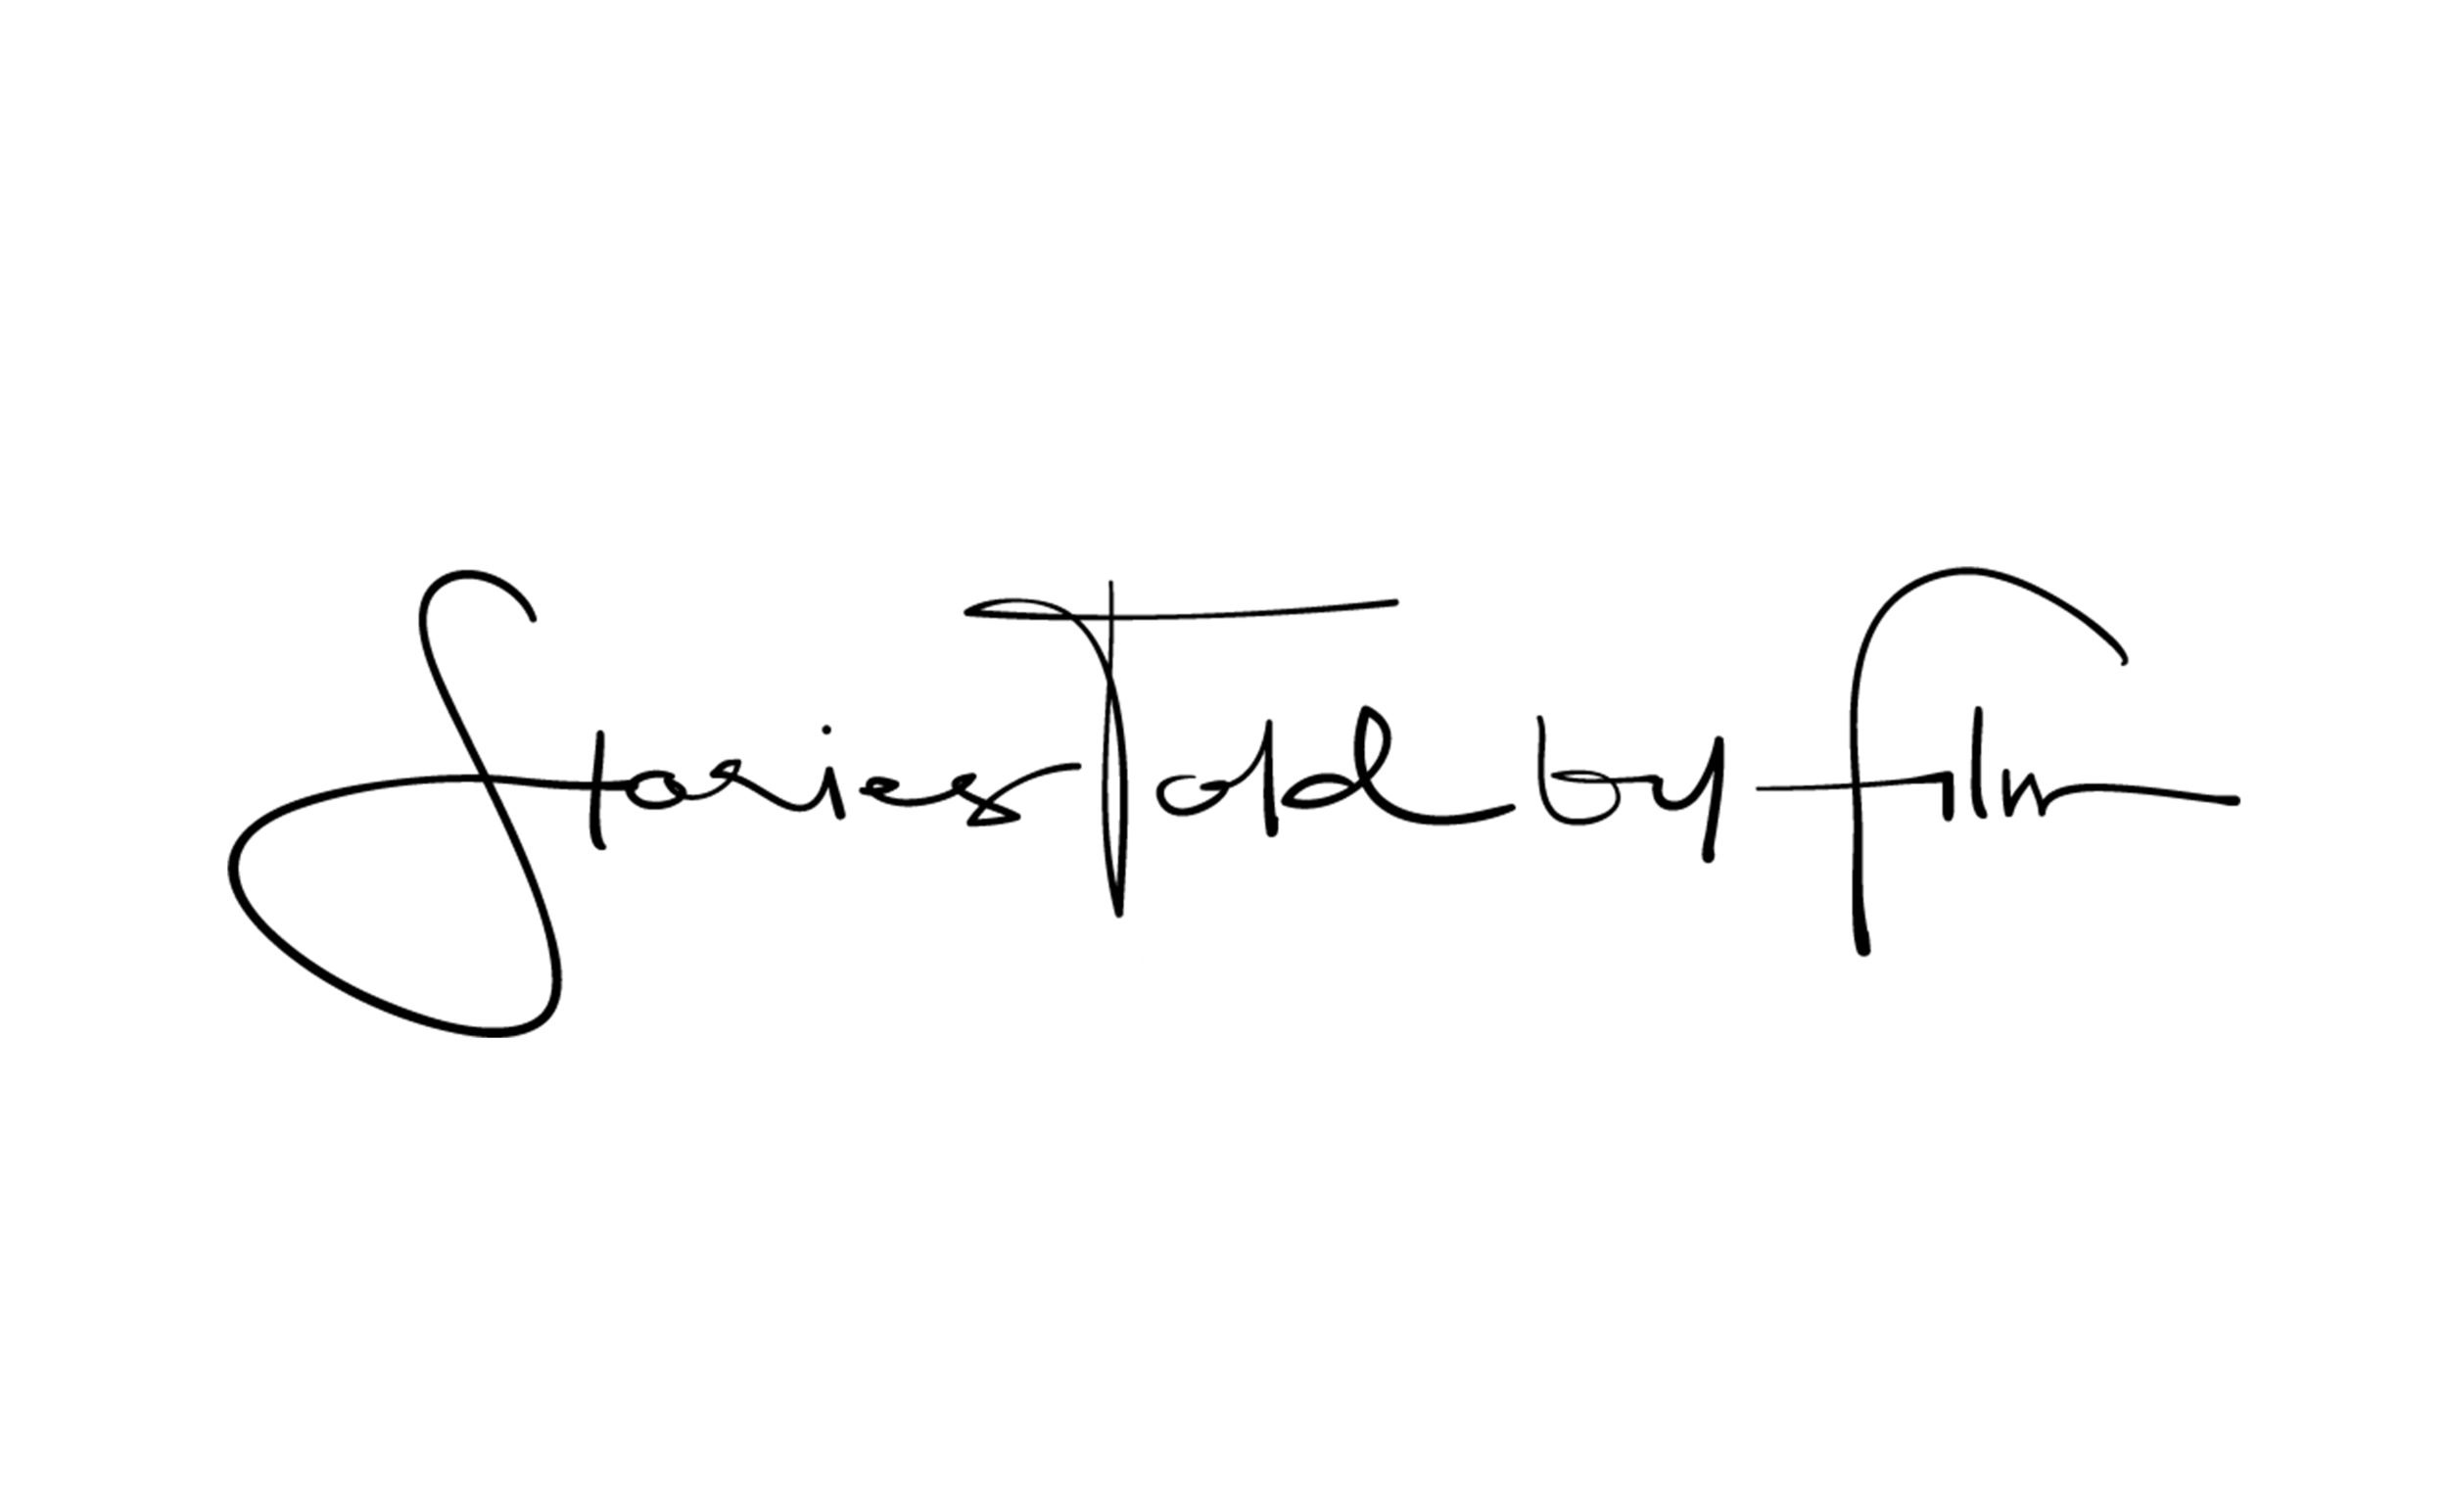 2019 STBF logo black -1.png